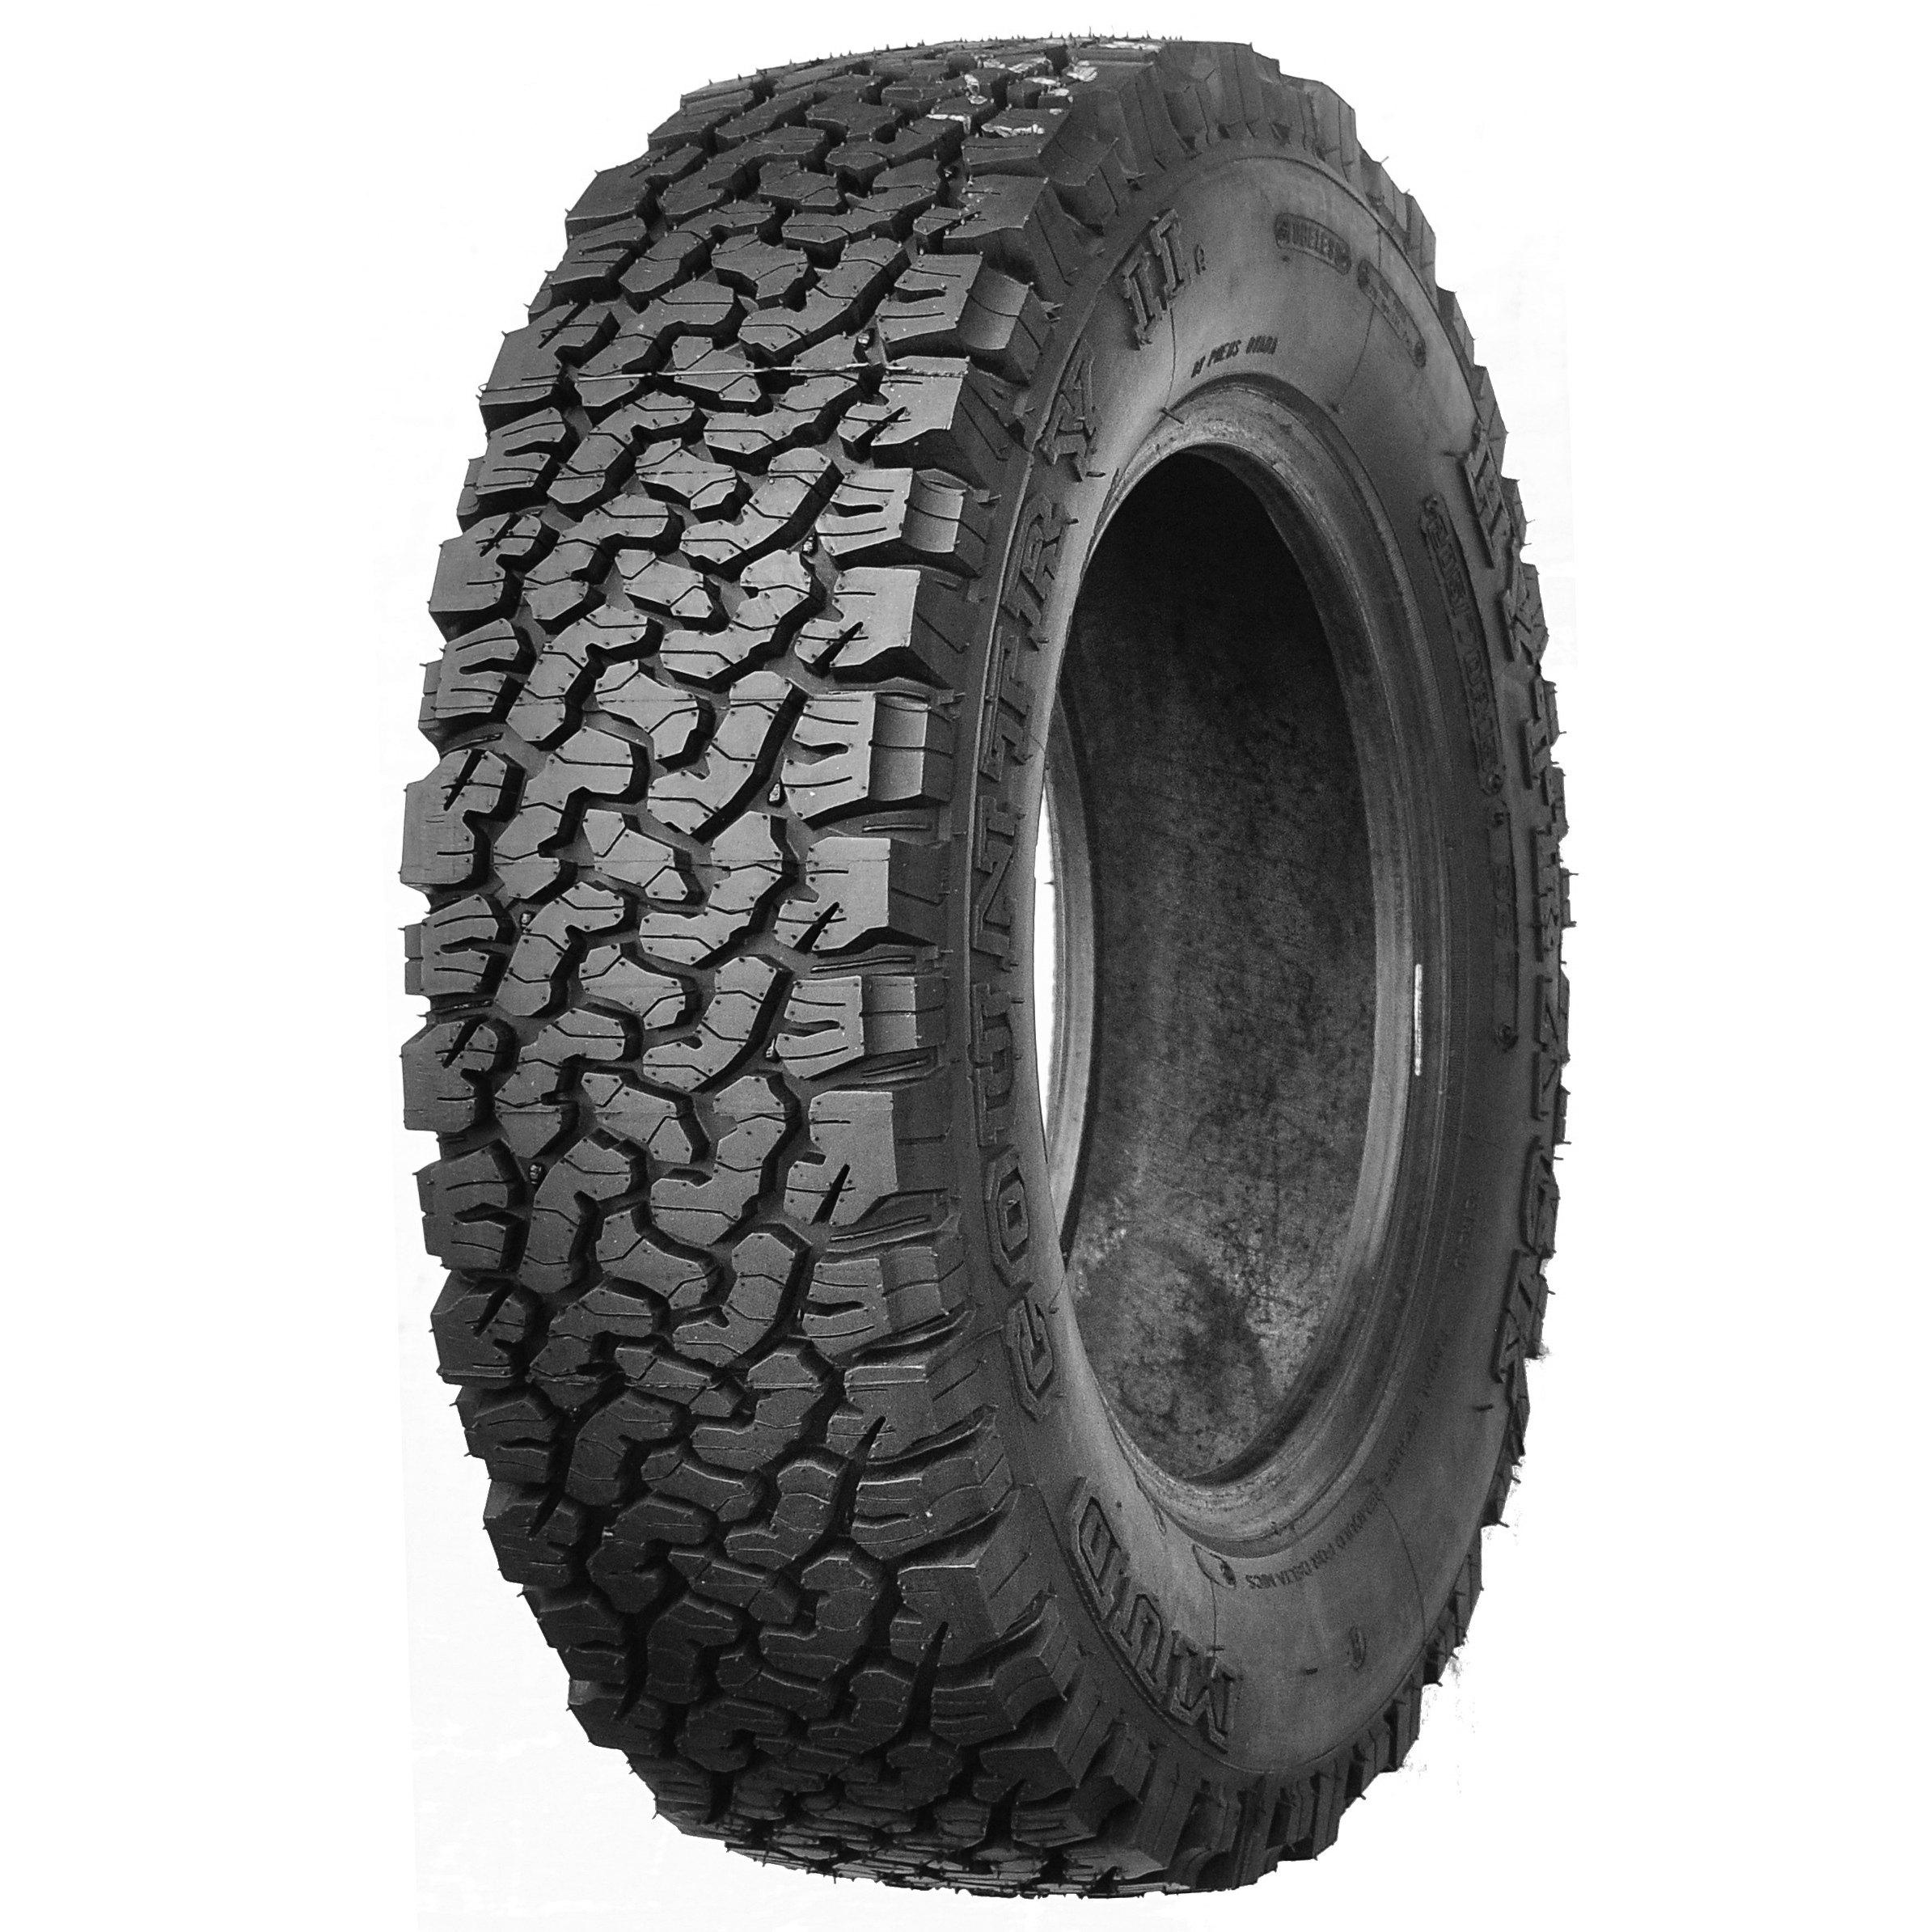 Goodyear Tires For Sale >> Off-road tire BFG KO2 195/80 R15 Italian company Pneus Ovada